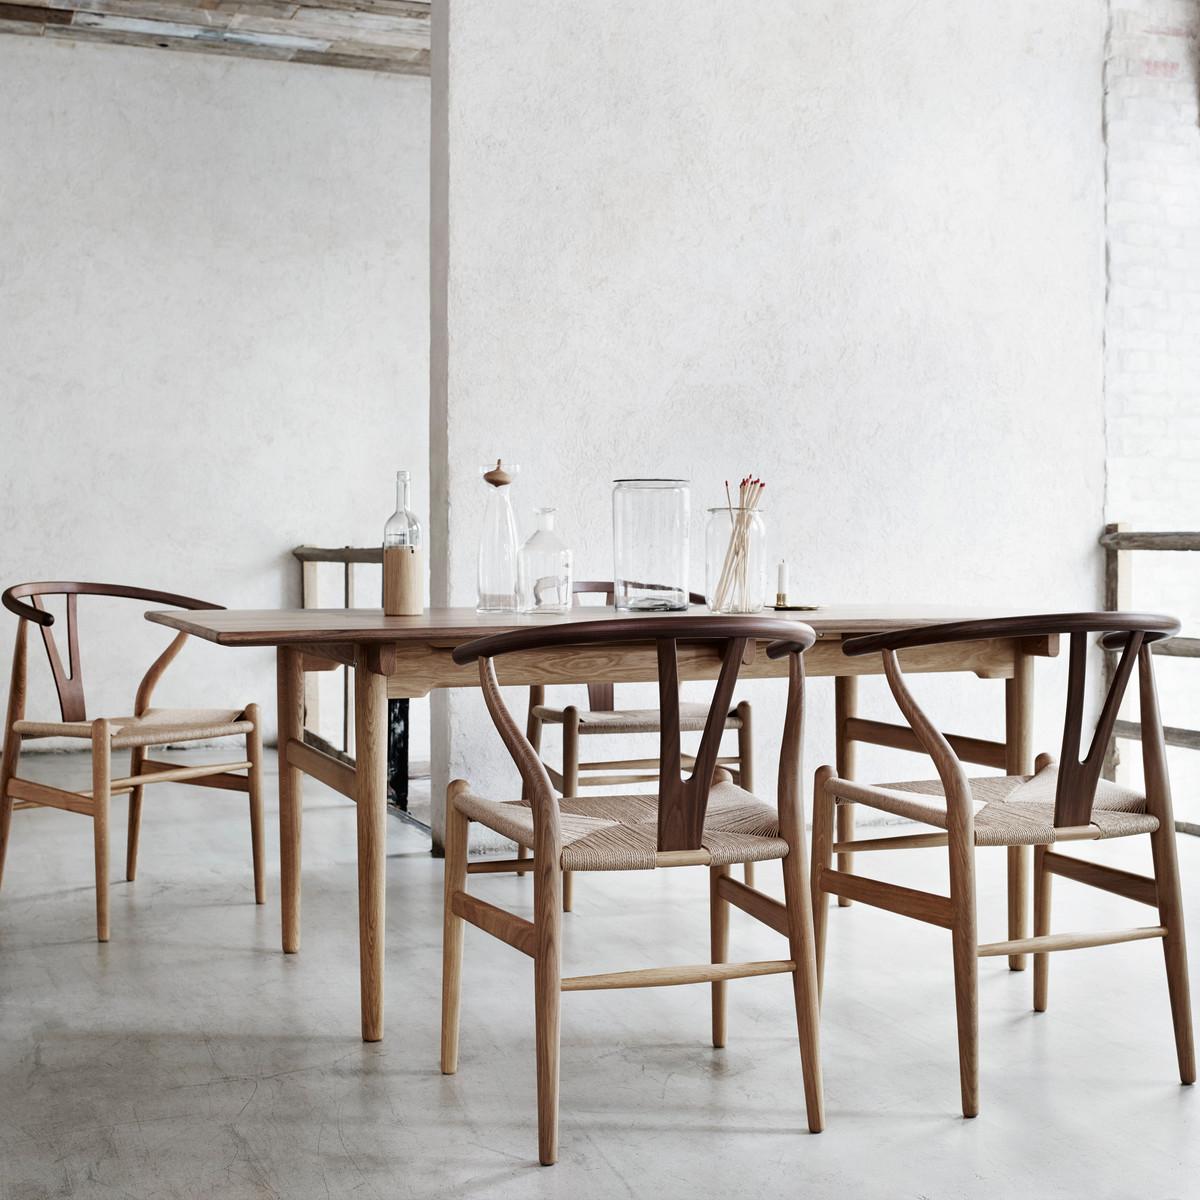 Journelles-Maison-Stylisten-Accessoires-Wishbone-Chair